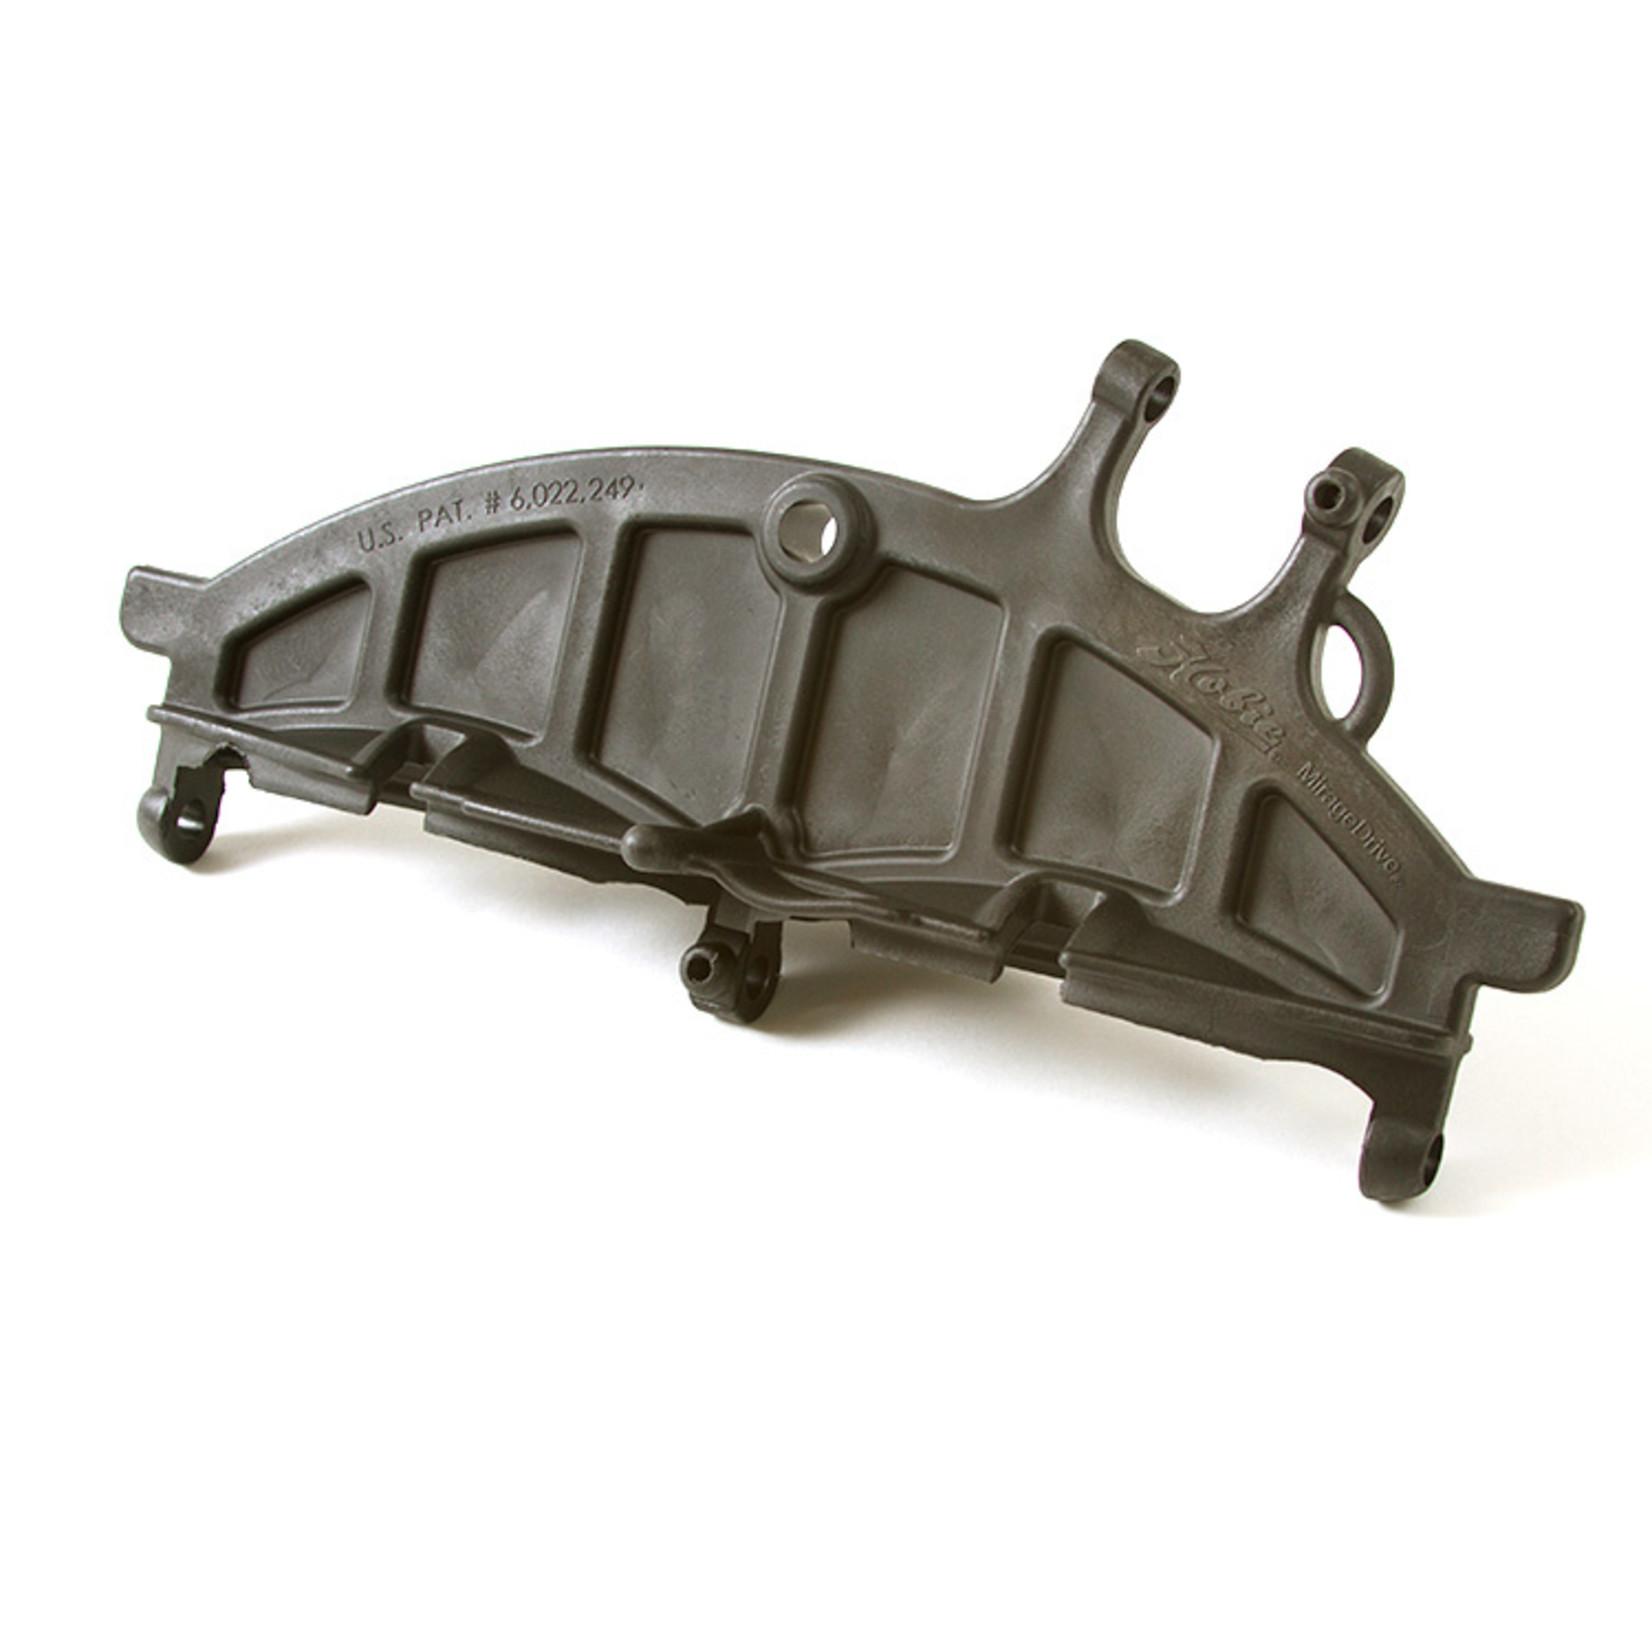 Hobie Spine Miragedrive - Plastic